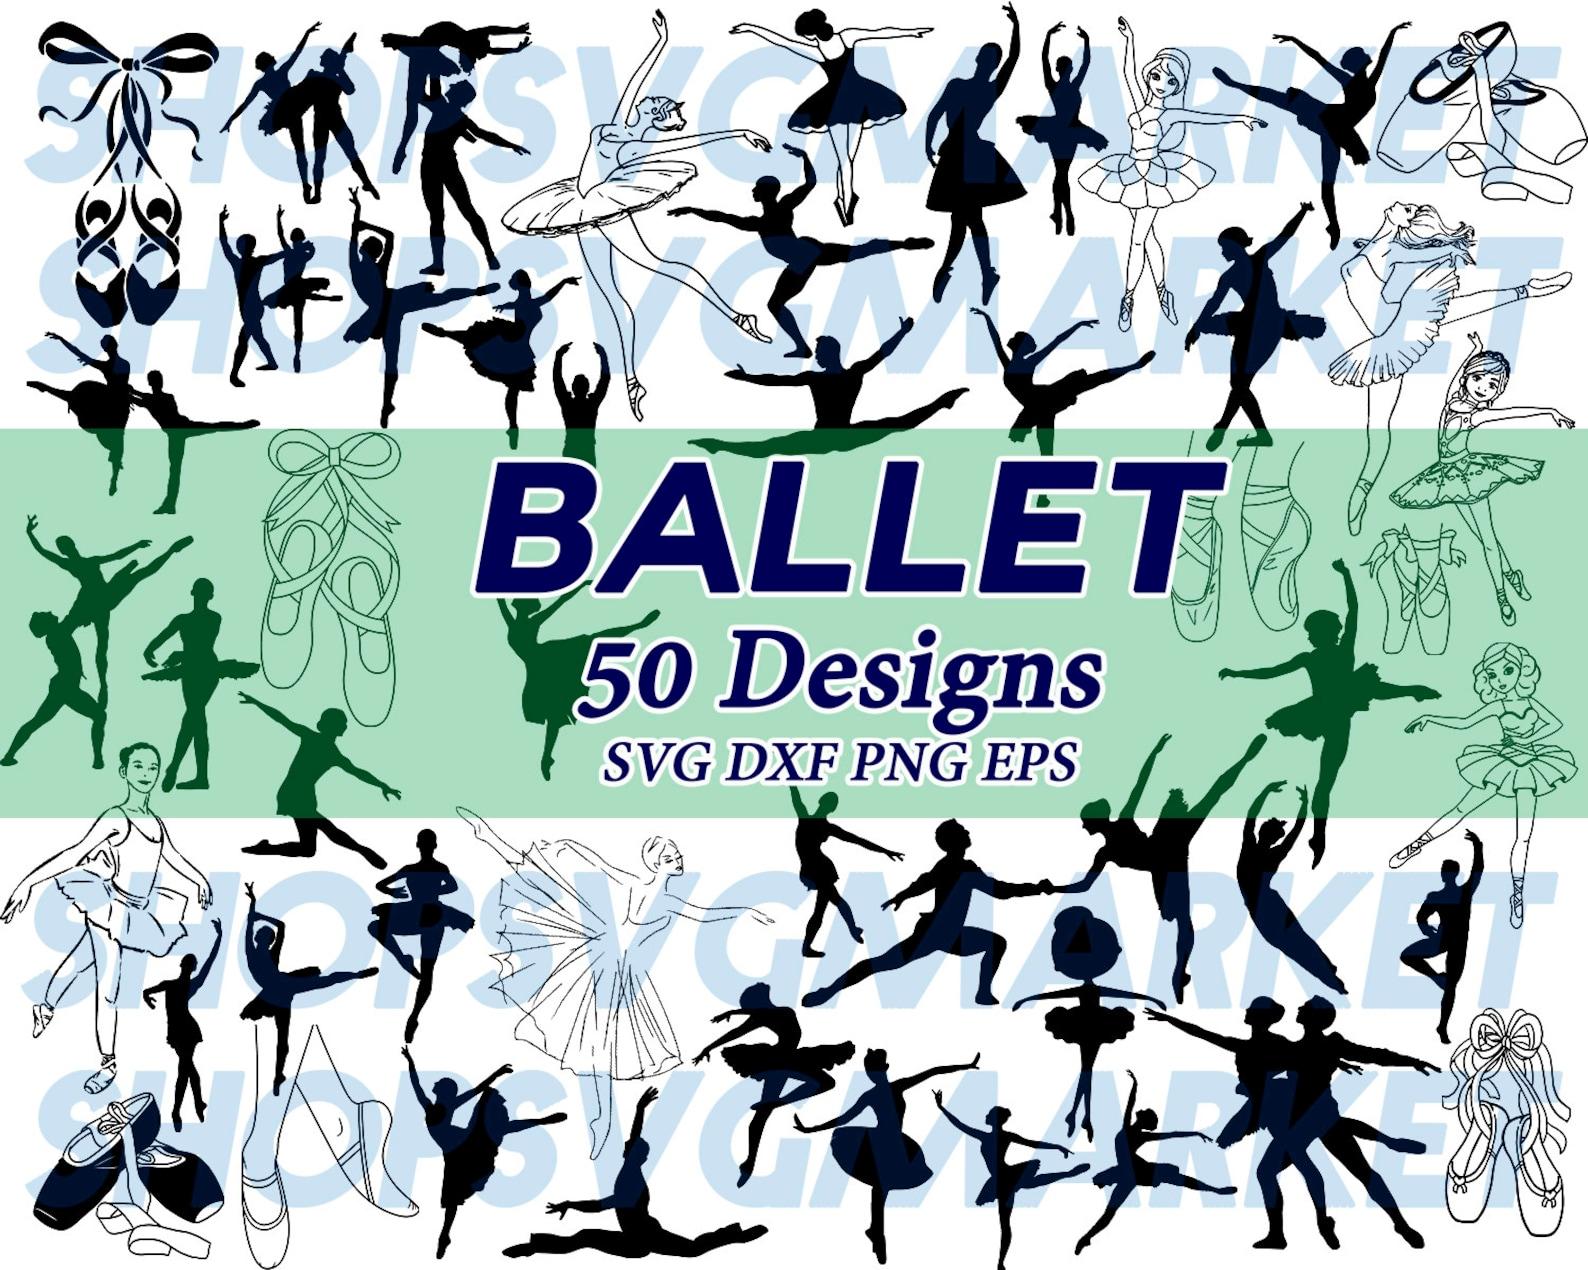 ballerina svg, ballet svg, dancer svg, ballet shoe svg, ballerina shoe svg, couple ballerina , clipart, silhouette, cut file, de